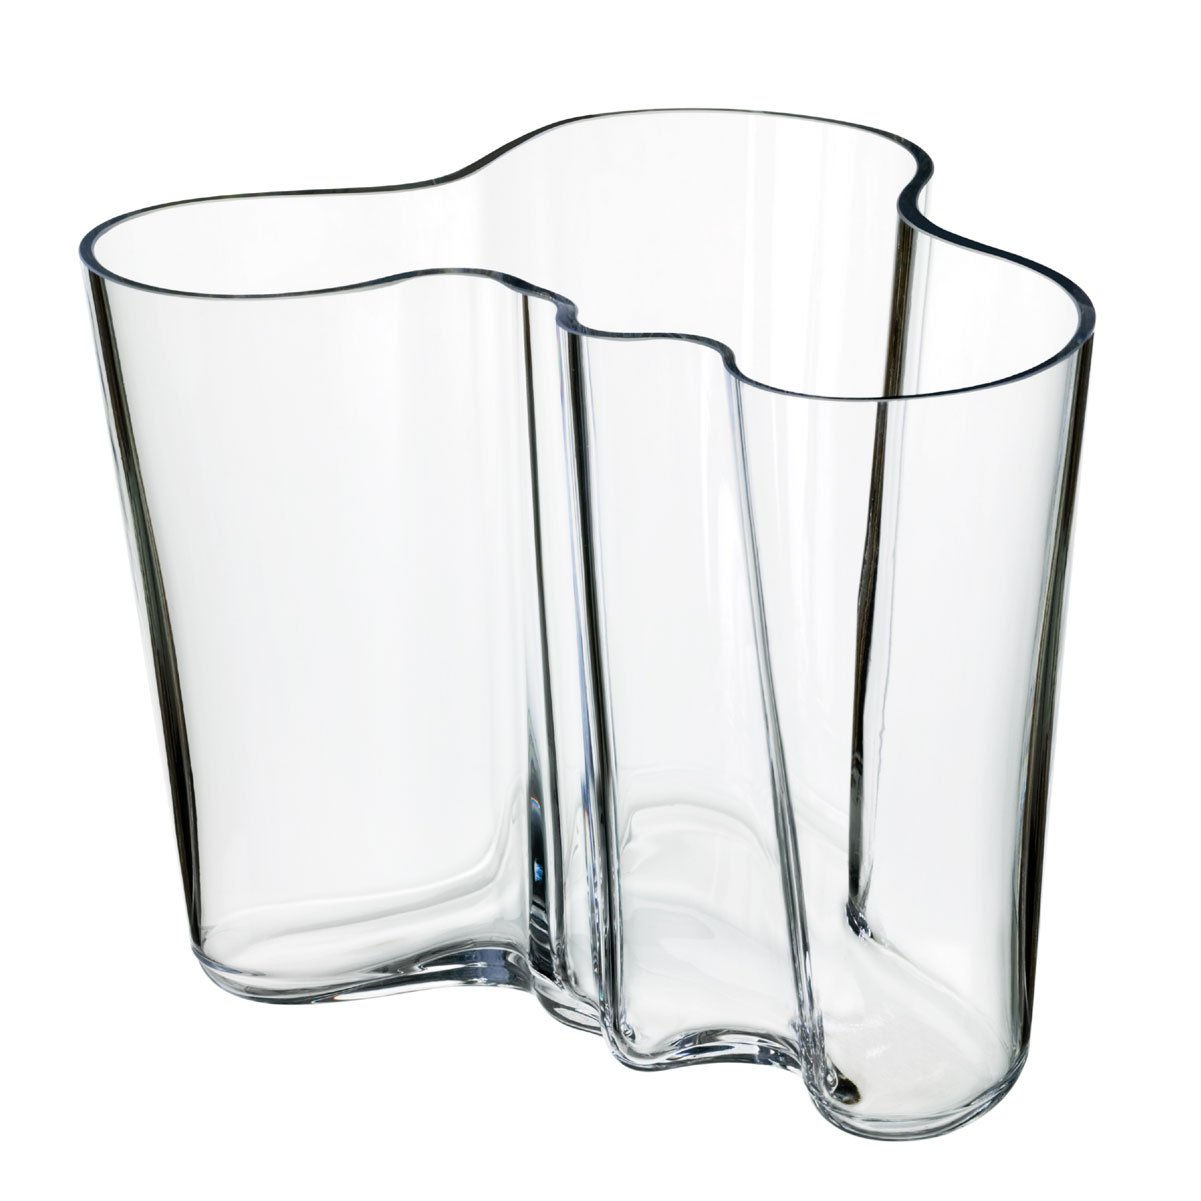 amazoncom iittala aalto inch glass vase home  kitchen - iittala aalto vase clear large